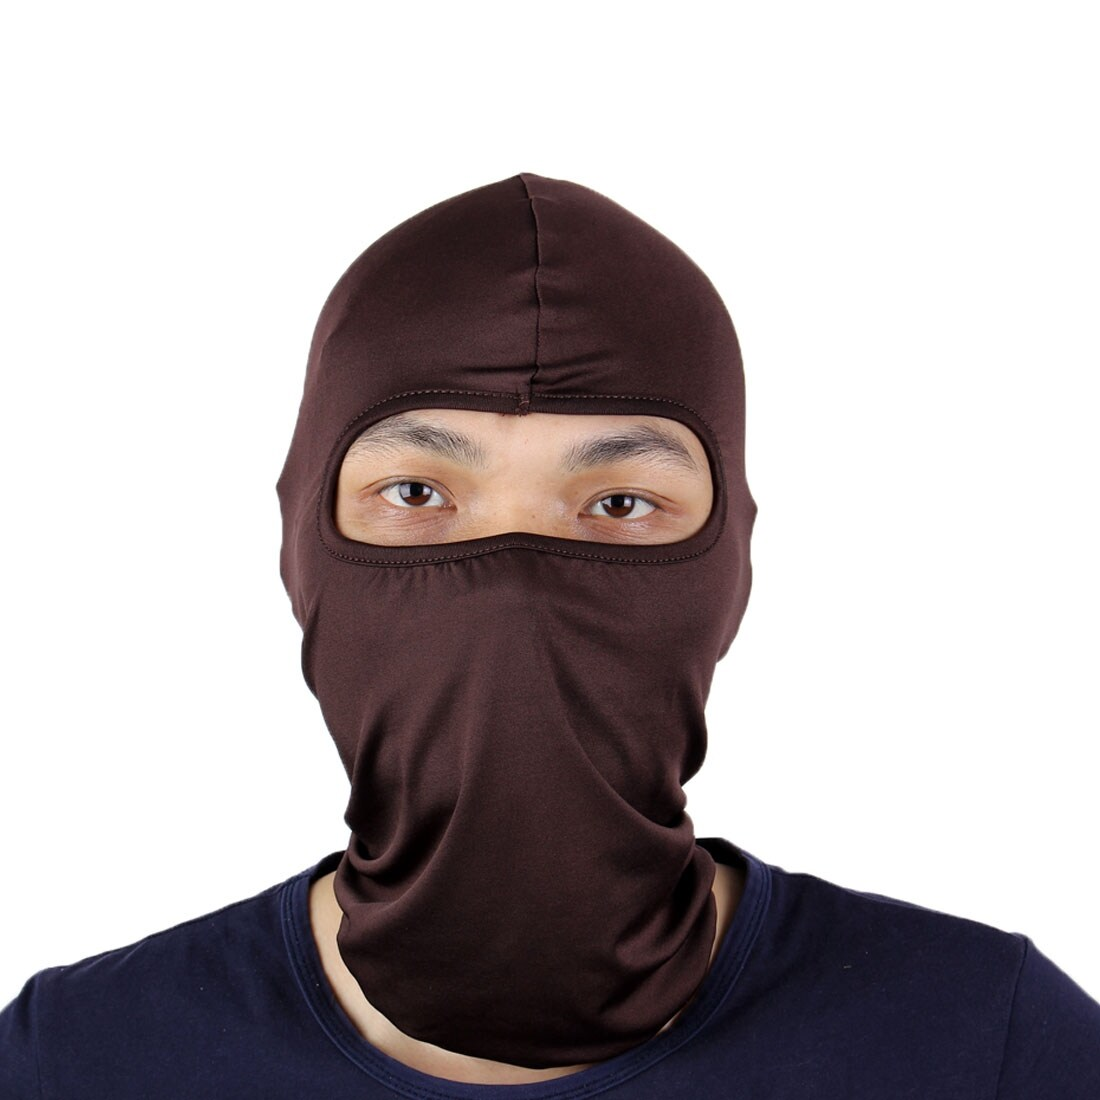 Outdoor Sport Gear Lycra Balaclava Full Face Mask Motorcycle Cycle Balaclava GY